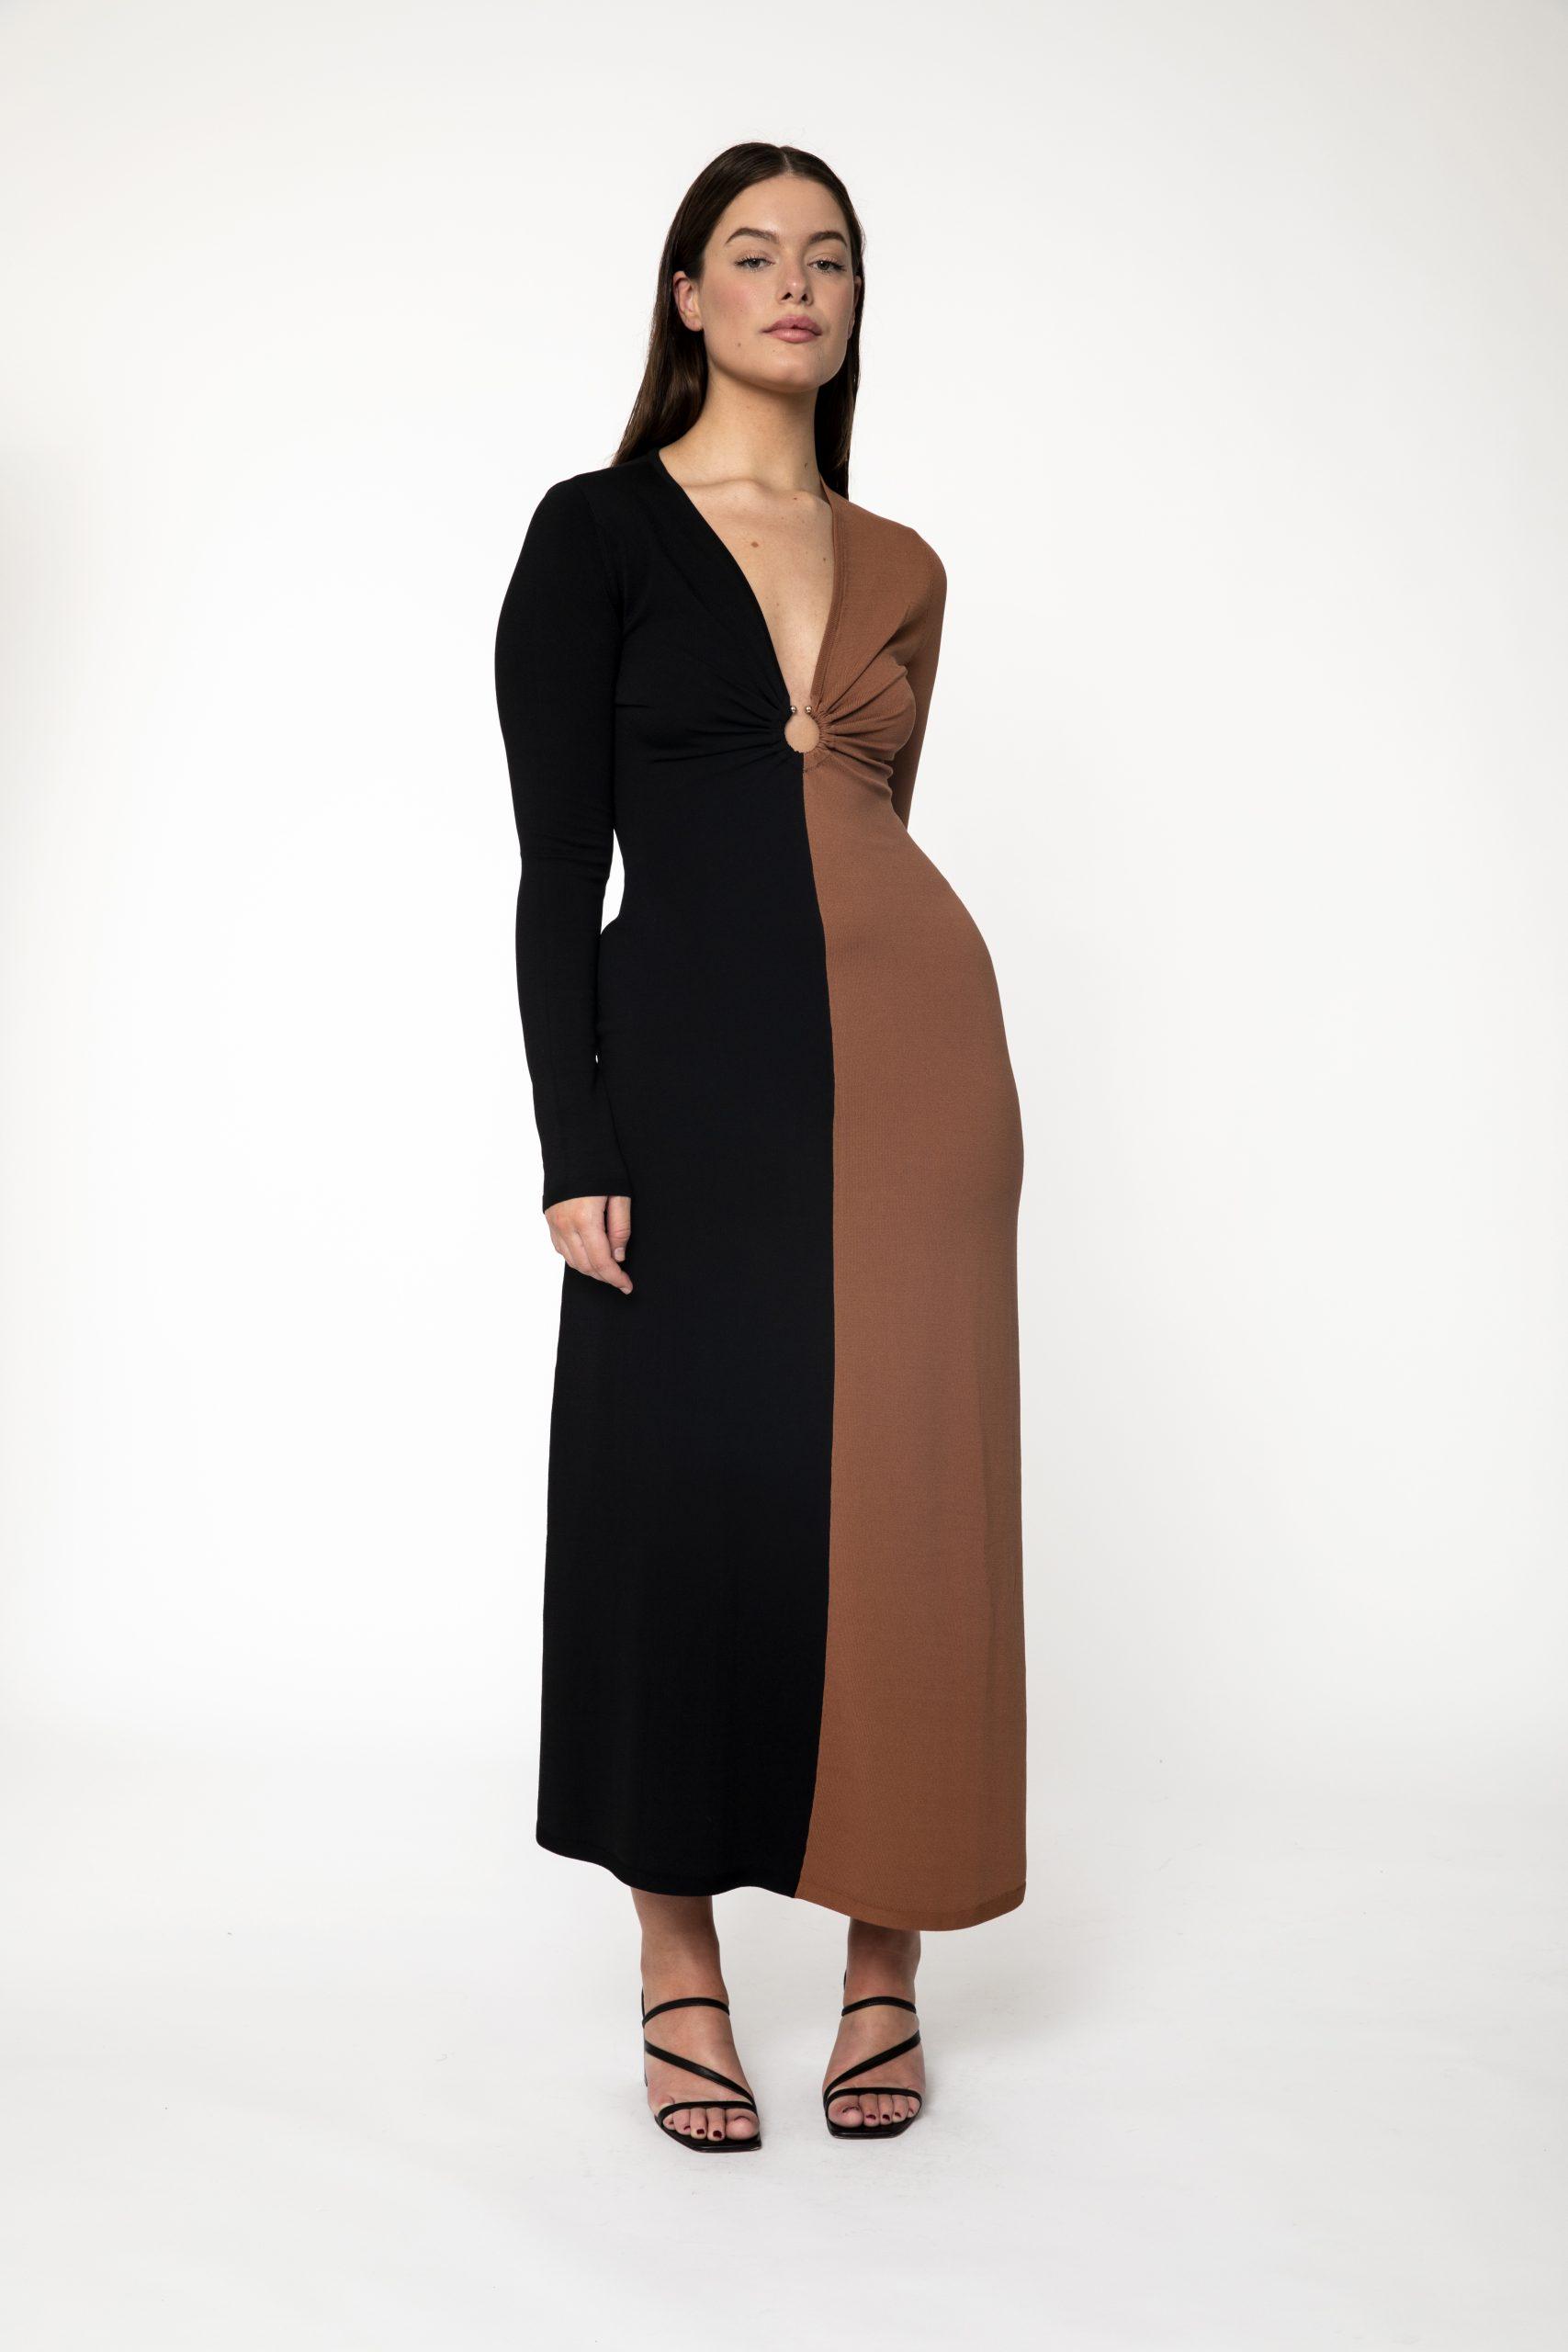 RUBY MILANO KNIT DRESS - ELLA